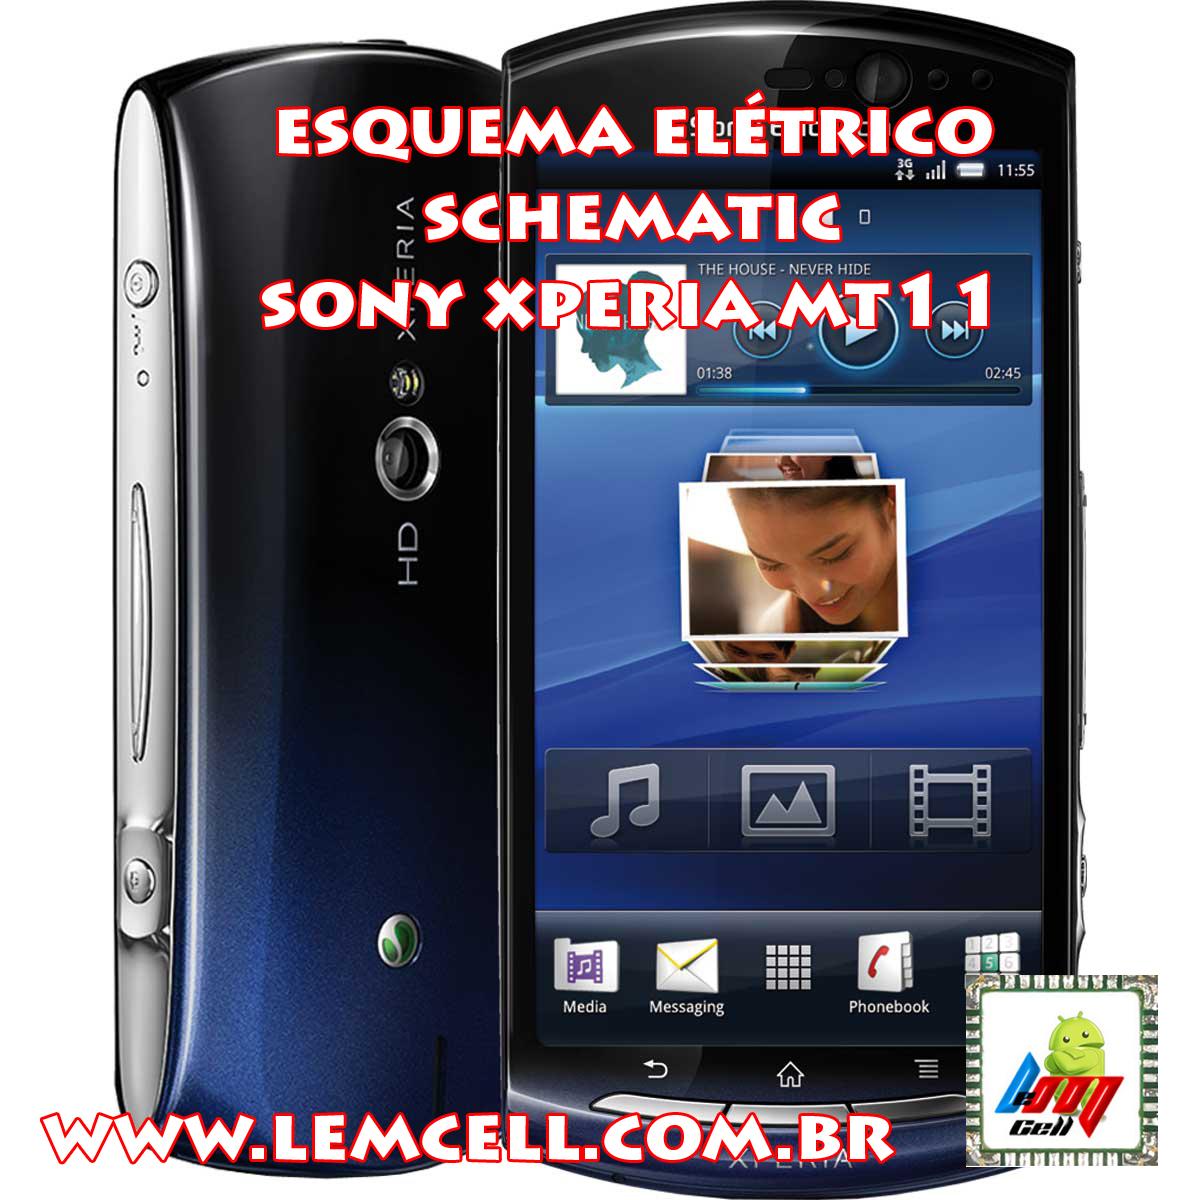 lemcell tutoriais esquema el trico celular smartphone sony ericsson rh lemcell com br Sony Ericsson Xperia Play Sony Xperia Xz